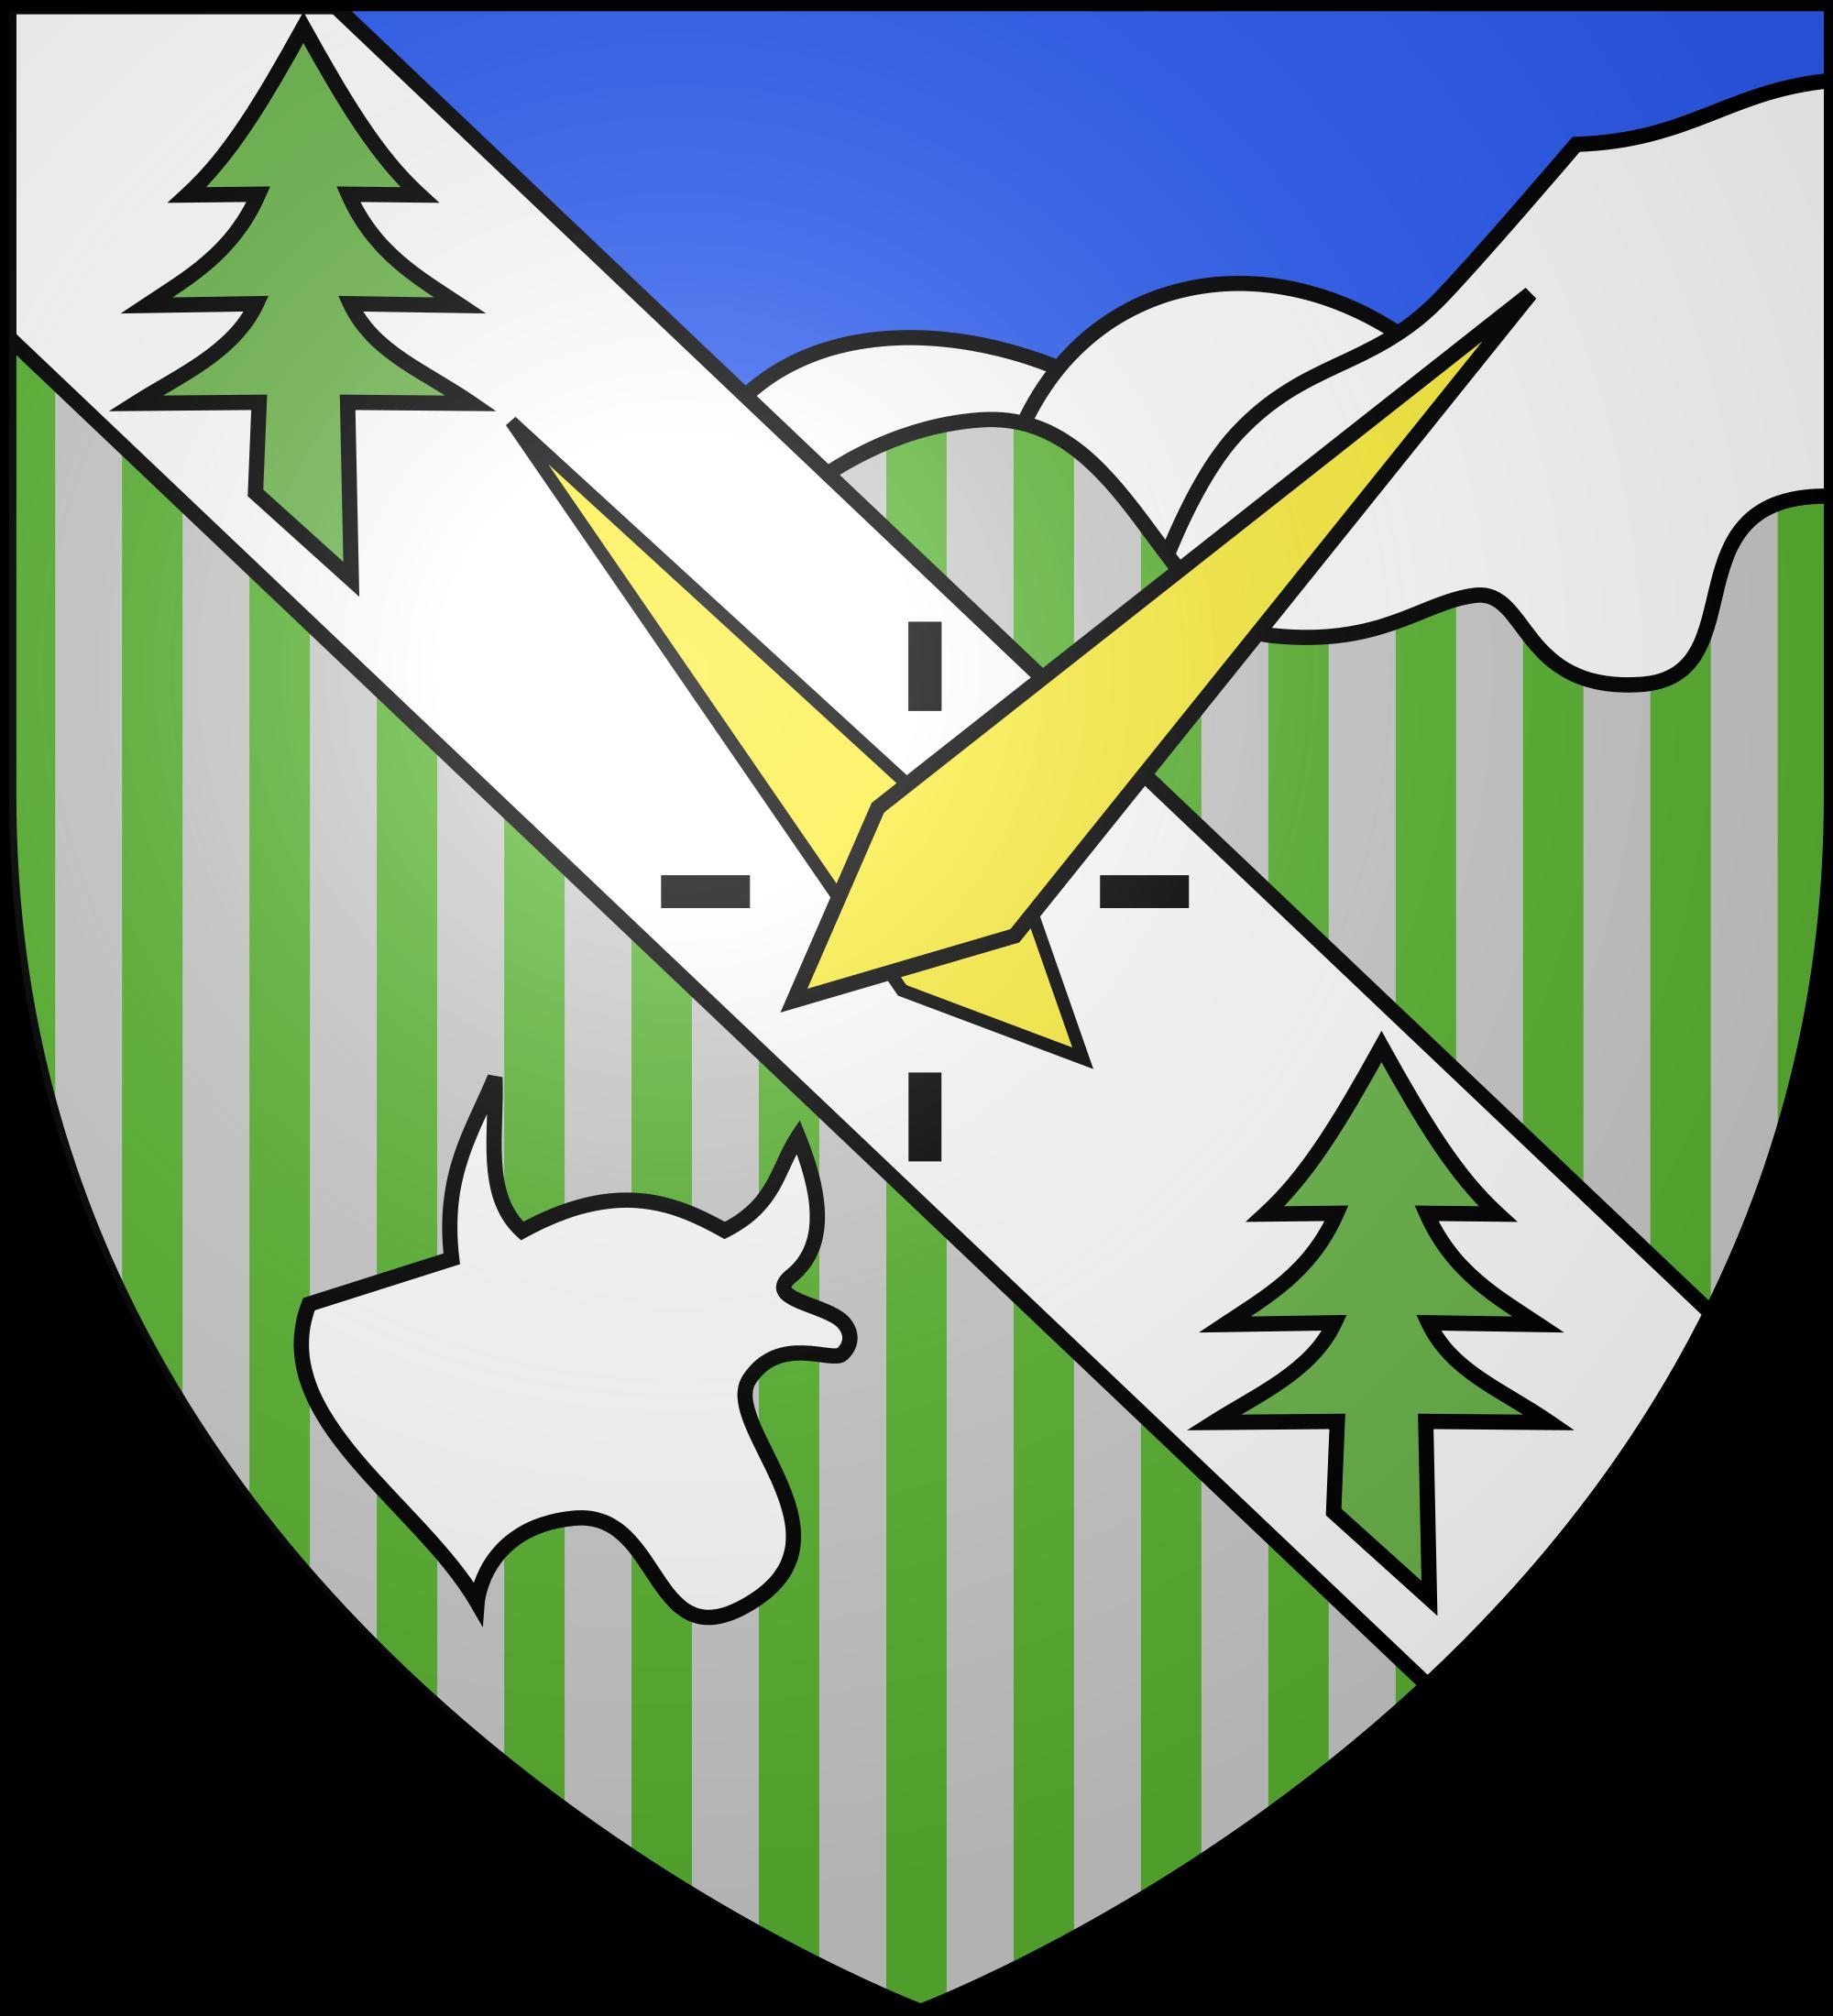 File:Blason ville fr Charquemont (Doubs).svg.